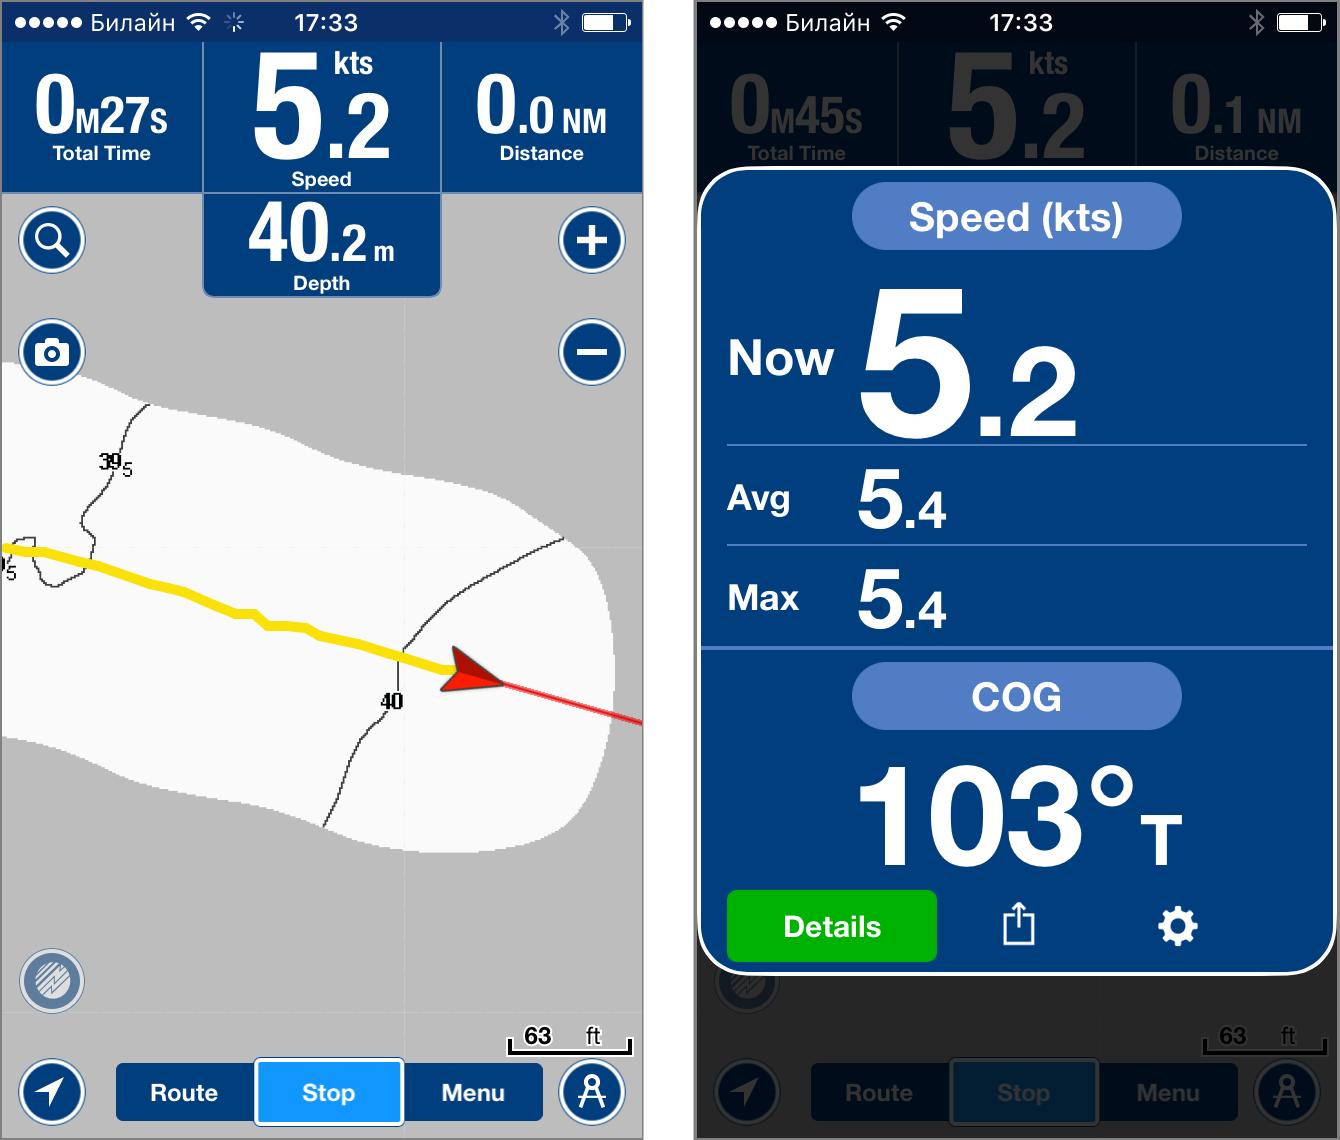 Yacht Devices News: Using Navionics Boating App with NMEA 2000 Wi-Fi